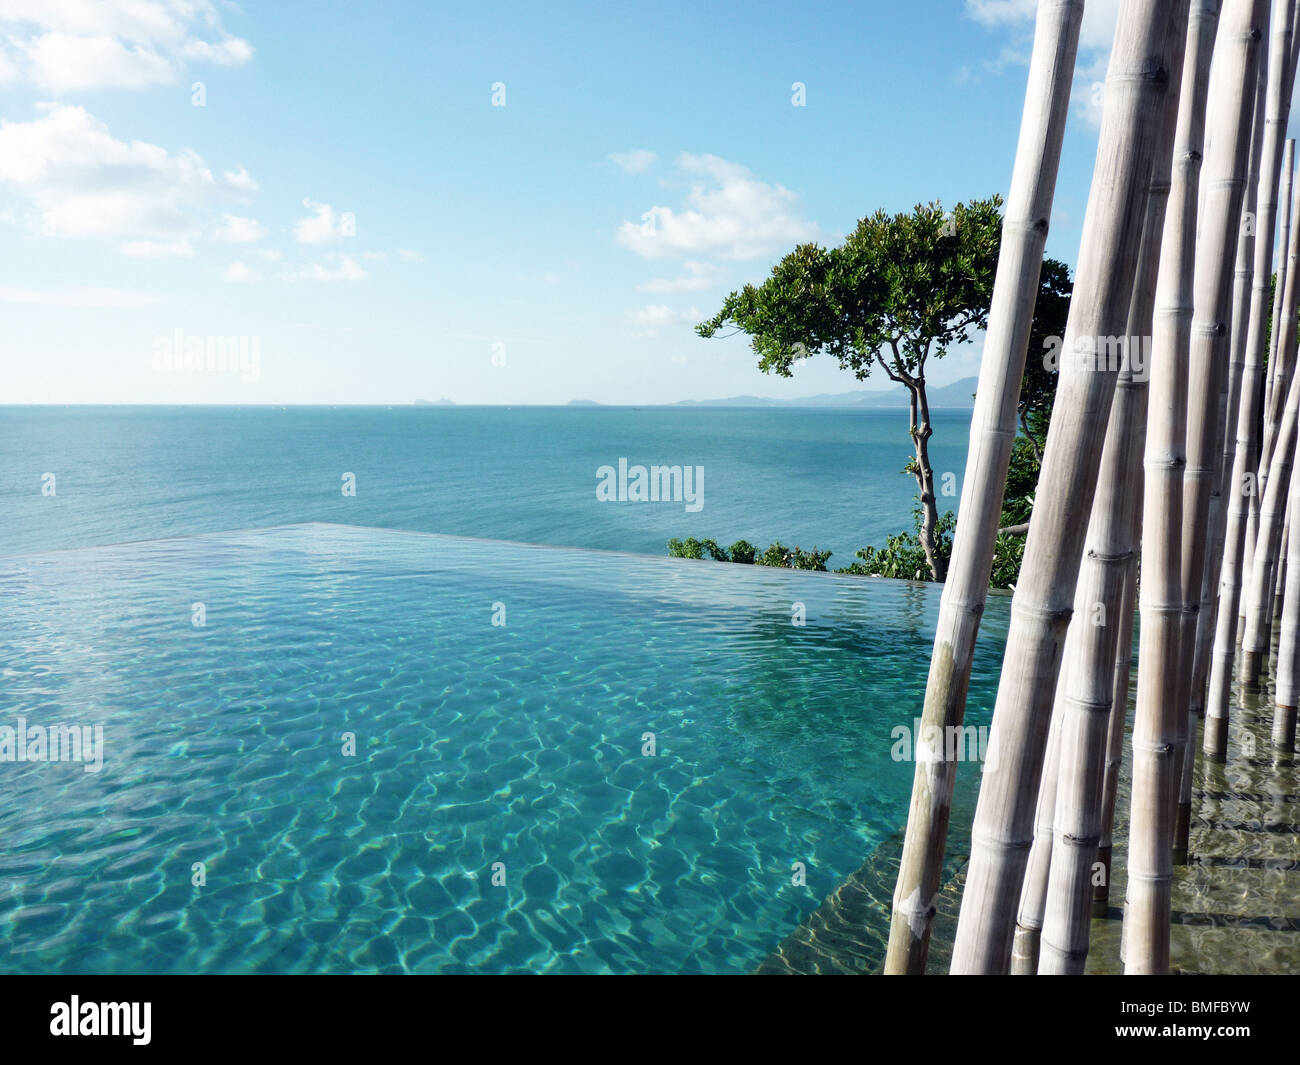 The pool at the Six Senses, Koh Samui - Stock Image